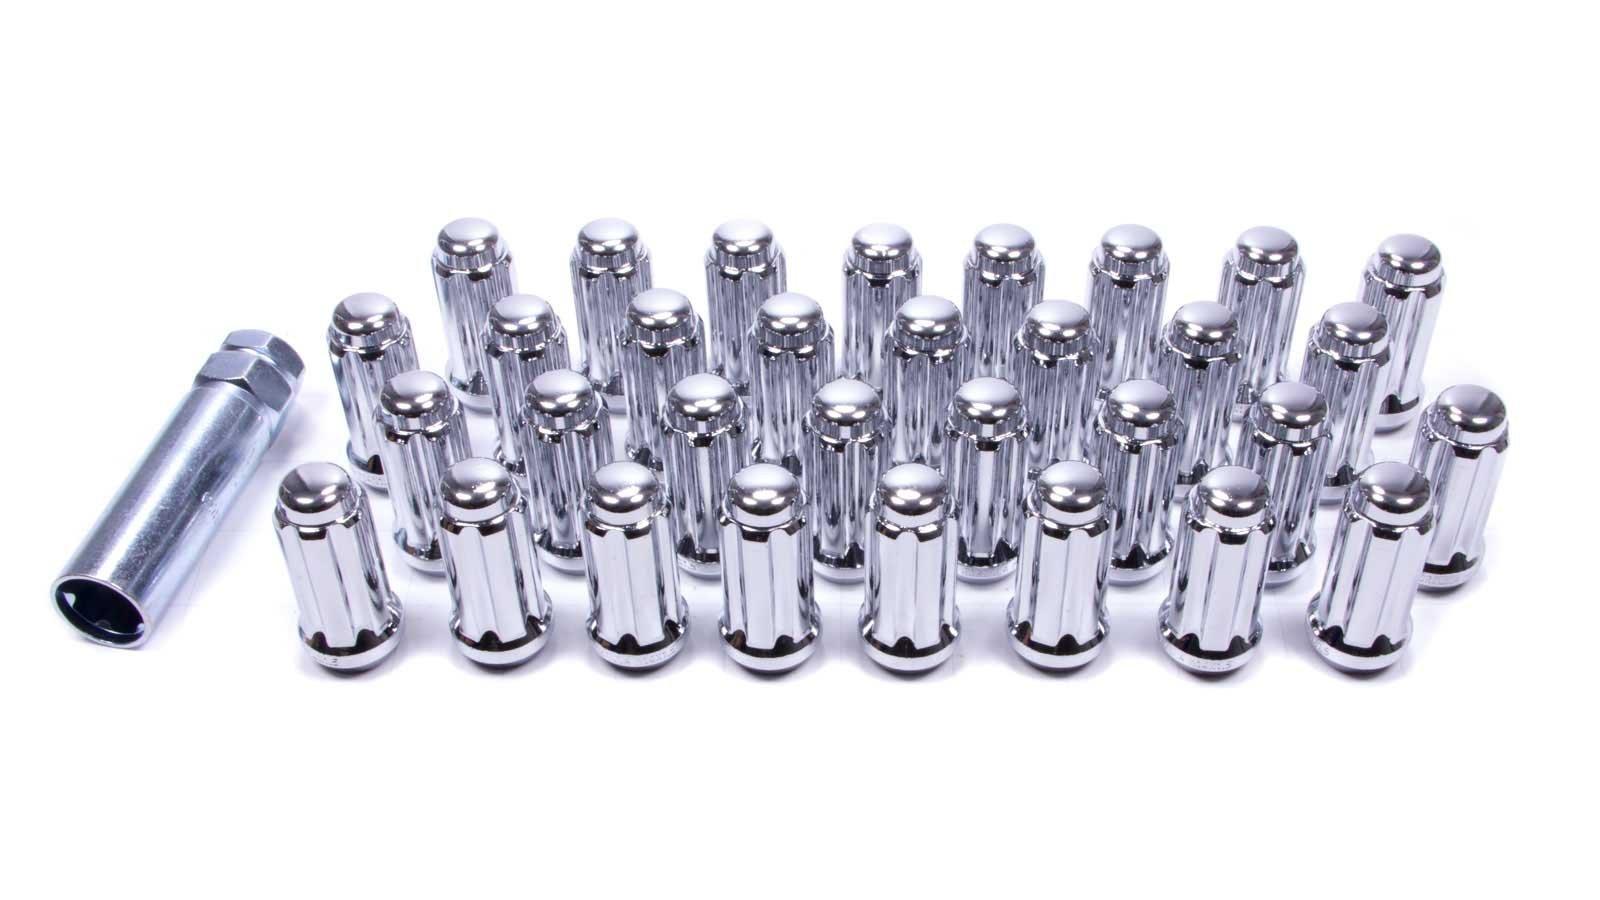 Gorilla Automotive 26145HT Small Diameter Duplex Acorn Chrome 8 Lug Kit (14mm x 1.50 Thread Size) - Pack of 32